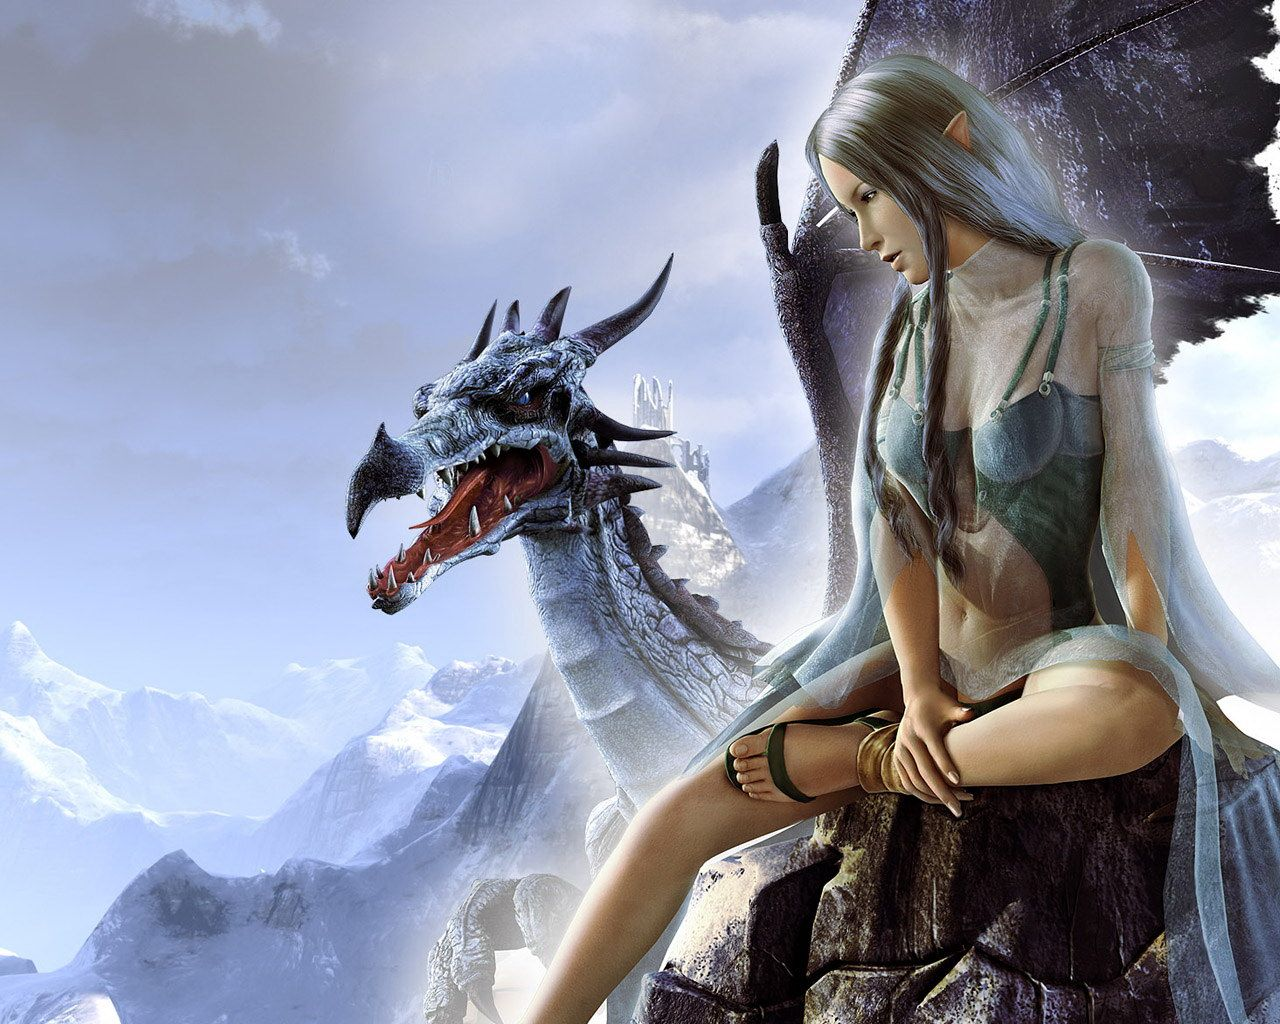 Download Wallpaper Beautiful Girl Elf Woman And Dragon Download Photo Wallpapers For Desktop Elf Dragon Fantasy Girl Dragon Girl Female Dragon